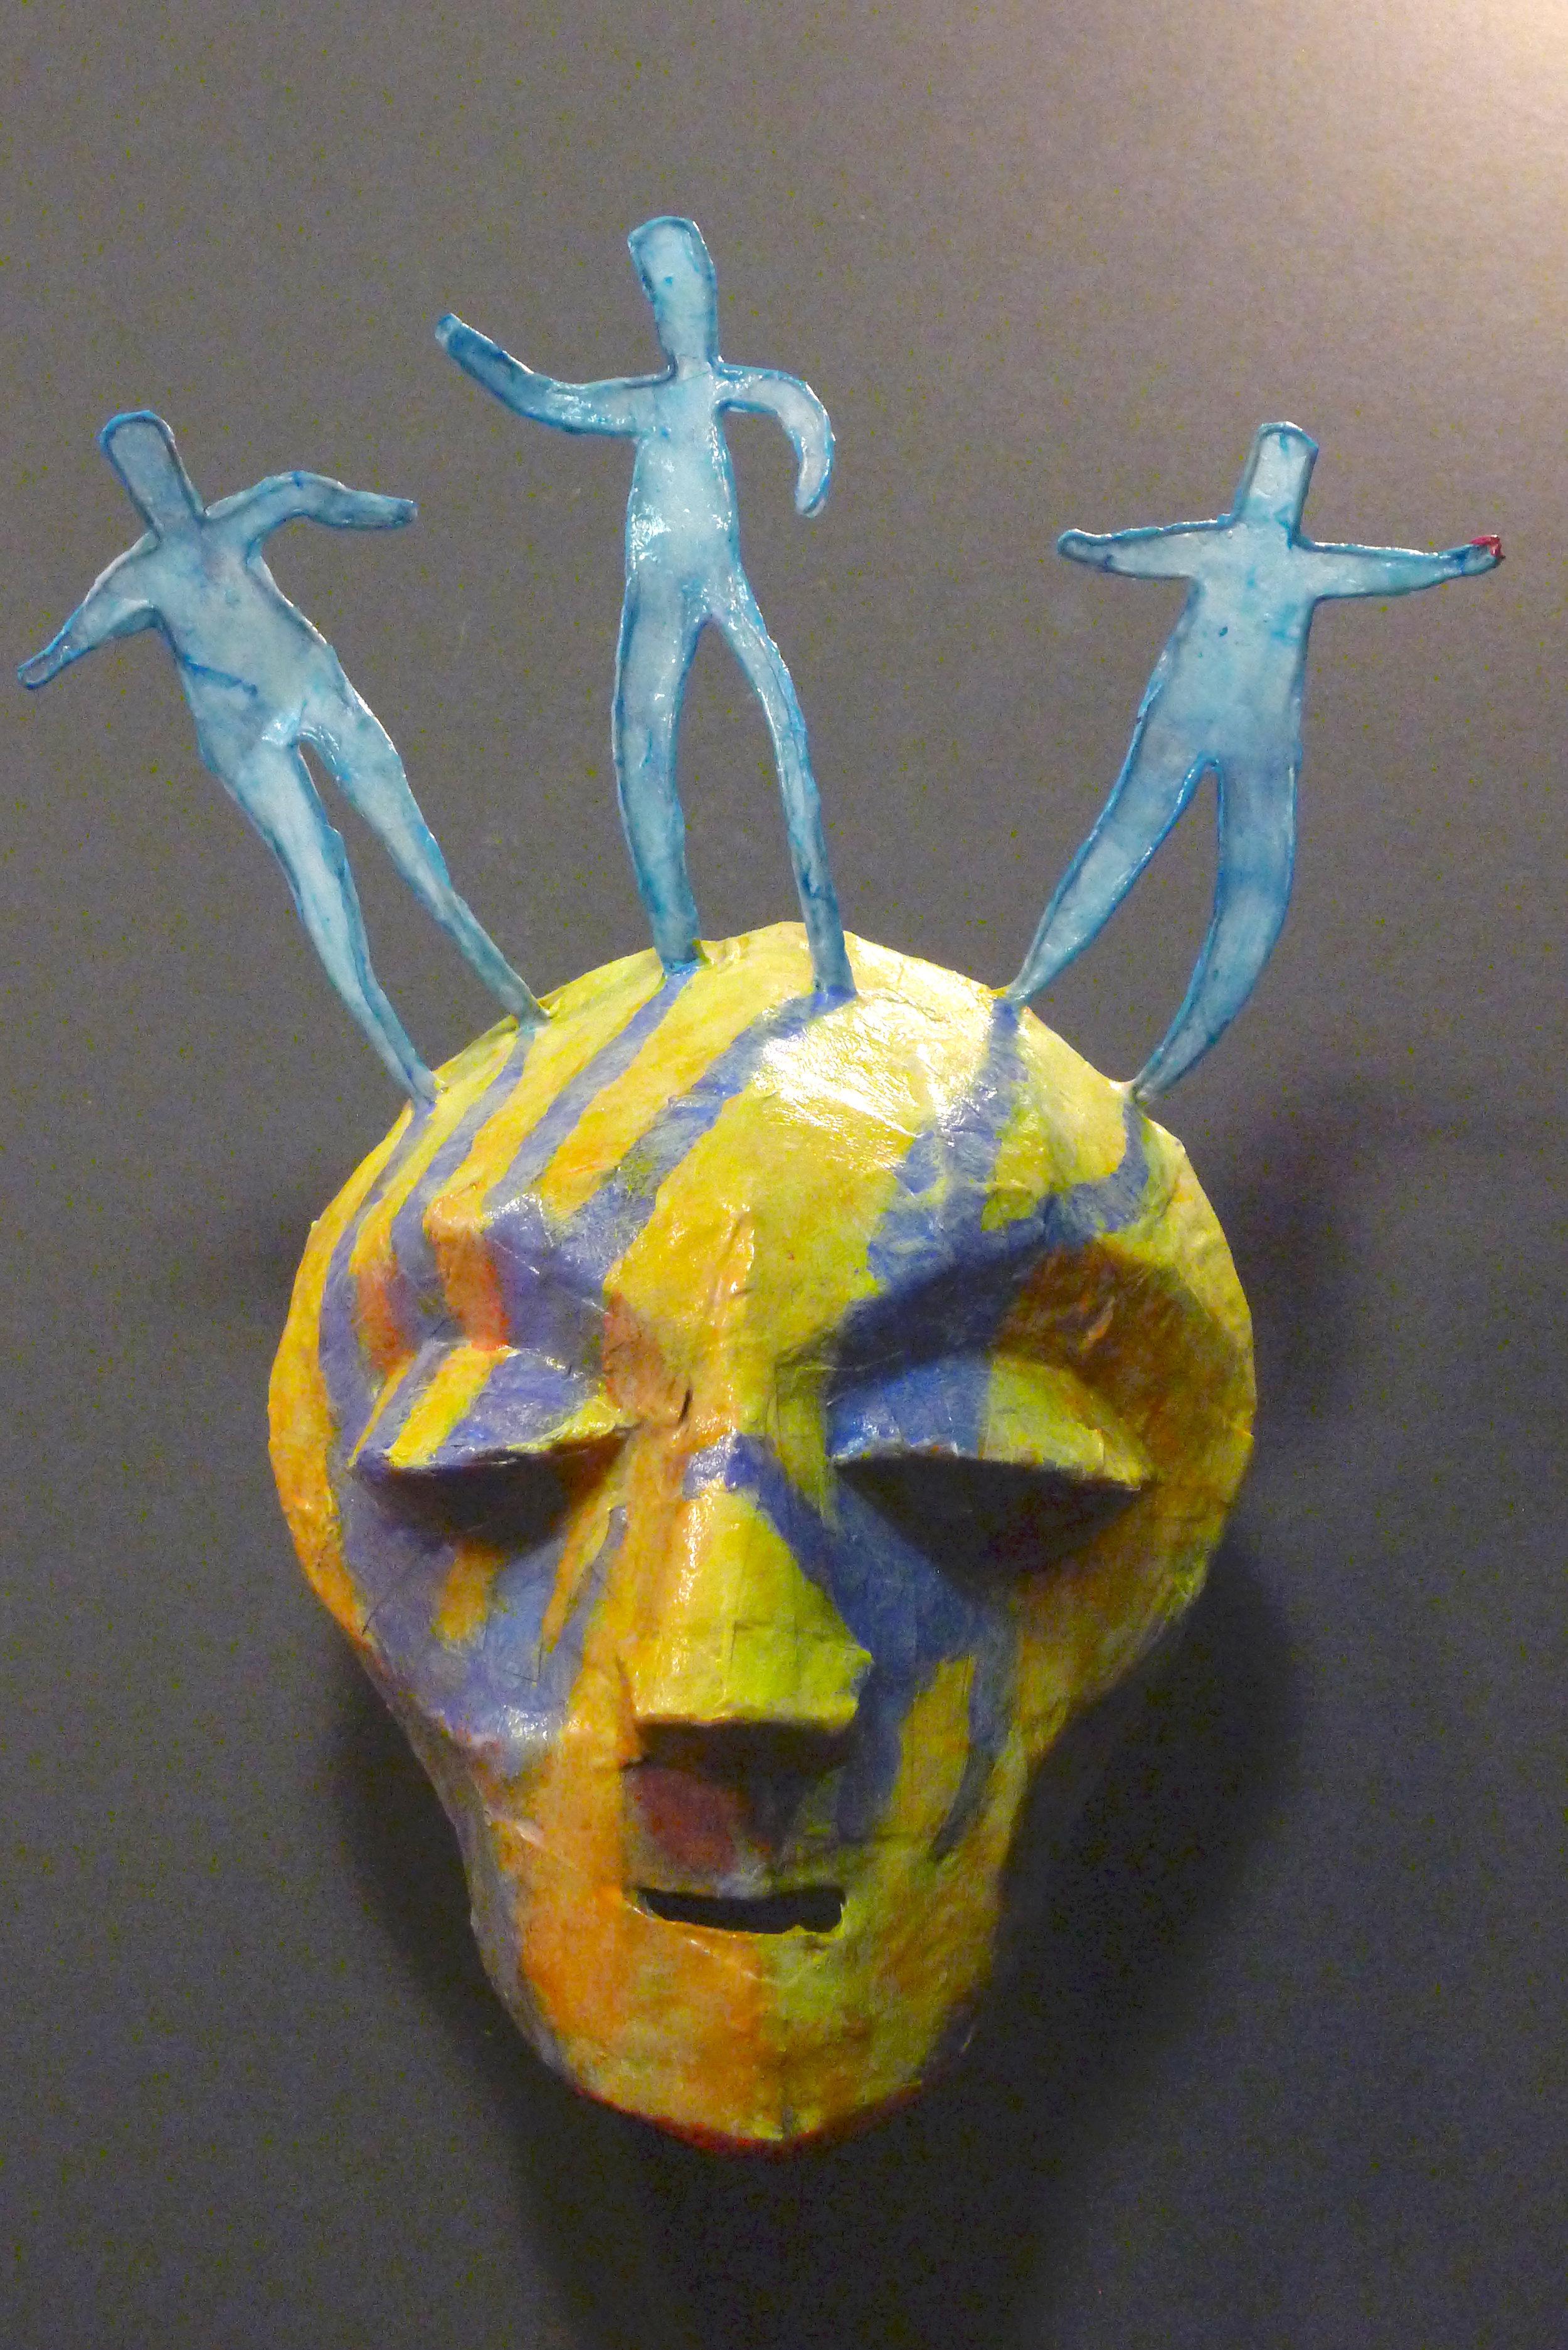 My Three Shadows - Mixed media mask